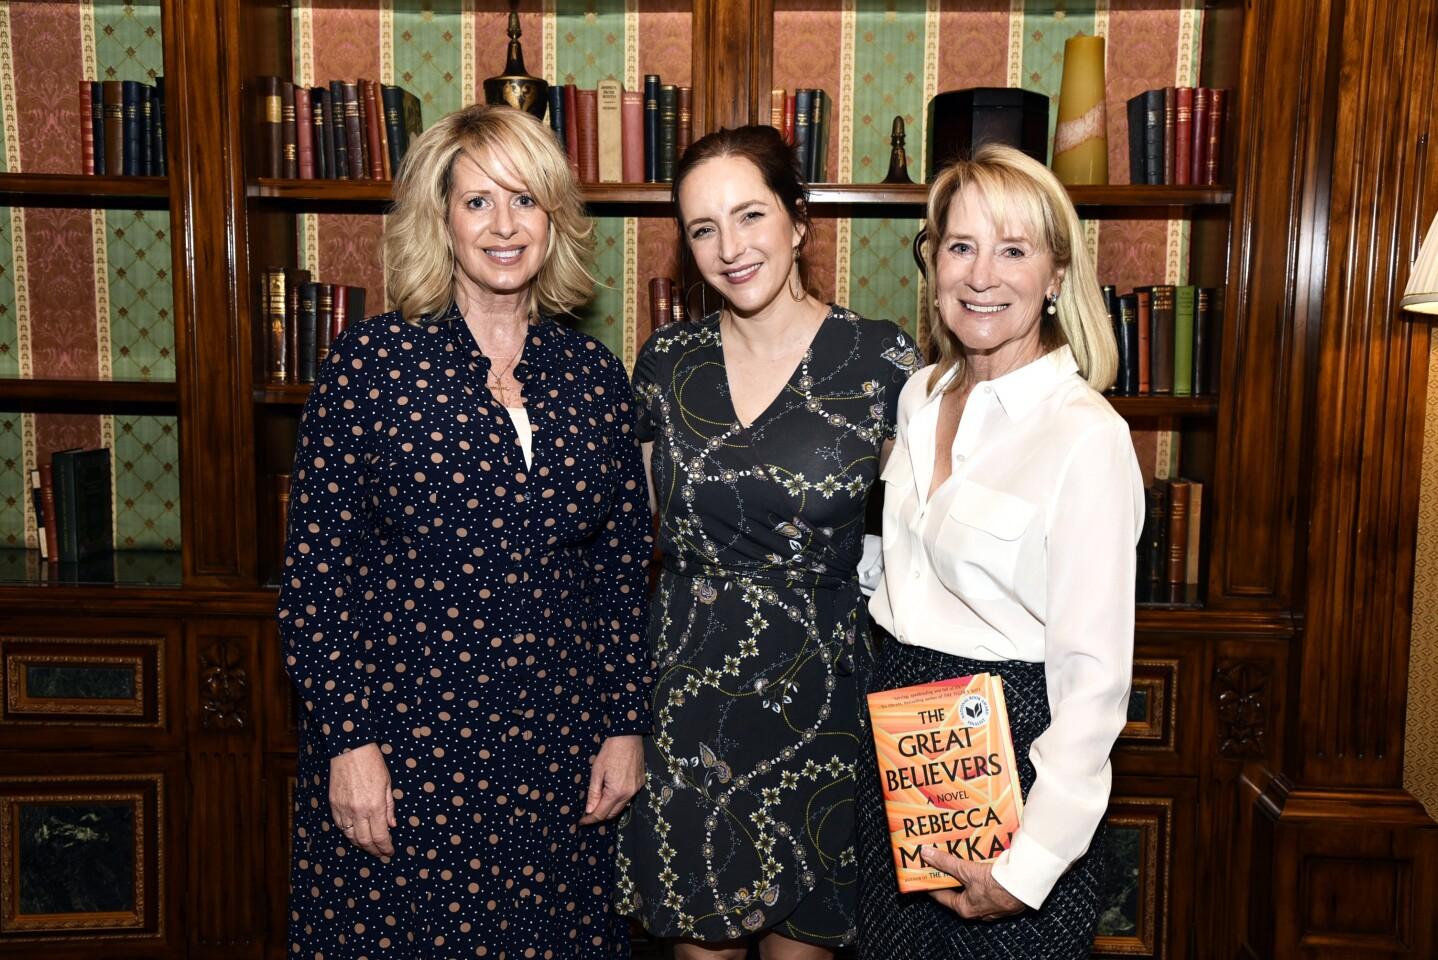 Northern Trust Vice President Events & Marketing Kelly Colvard, author Rebecca Makkai, RSF Literary Society President Candace Humber